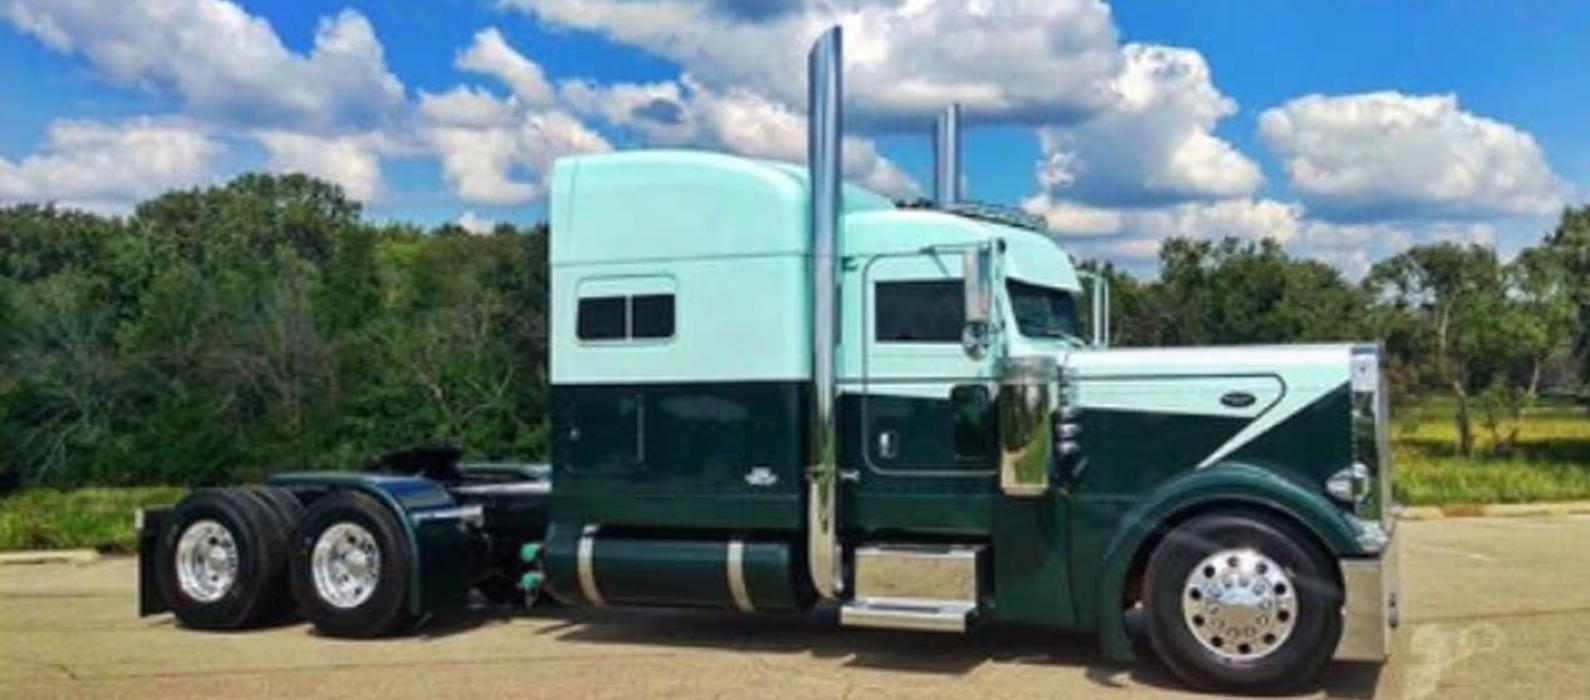 Green Blue Peterbilt Truck Skin Mod Ats Mod American Truck Simulator Mod